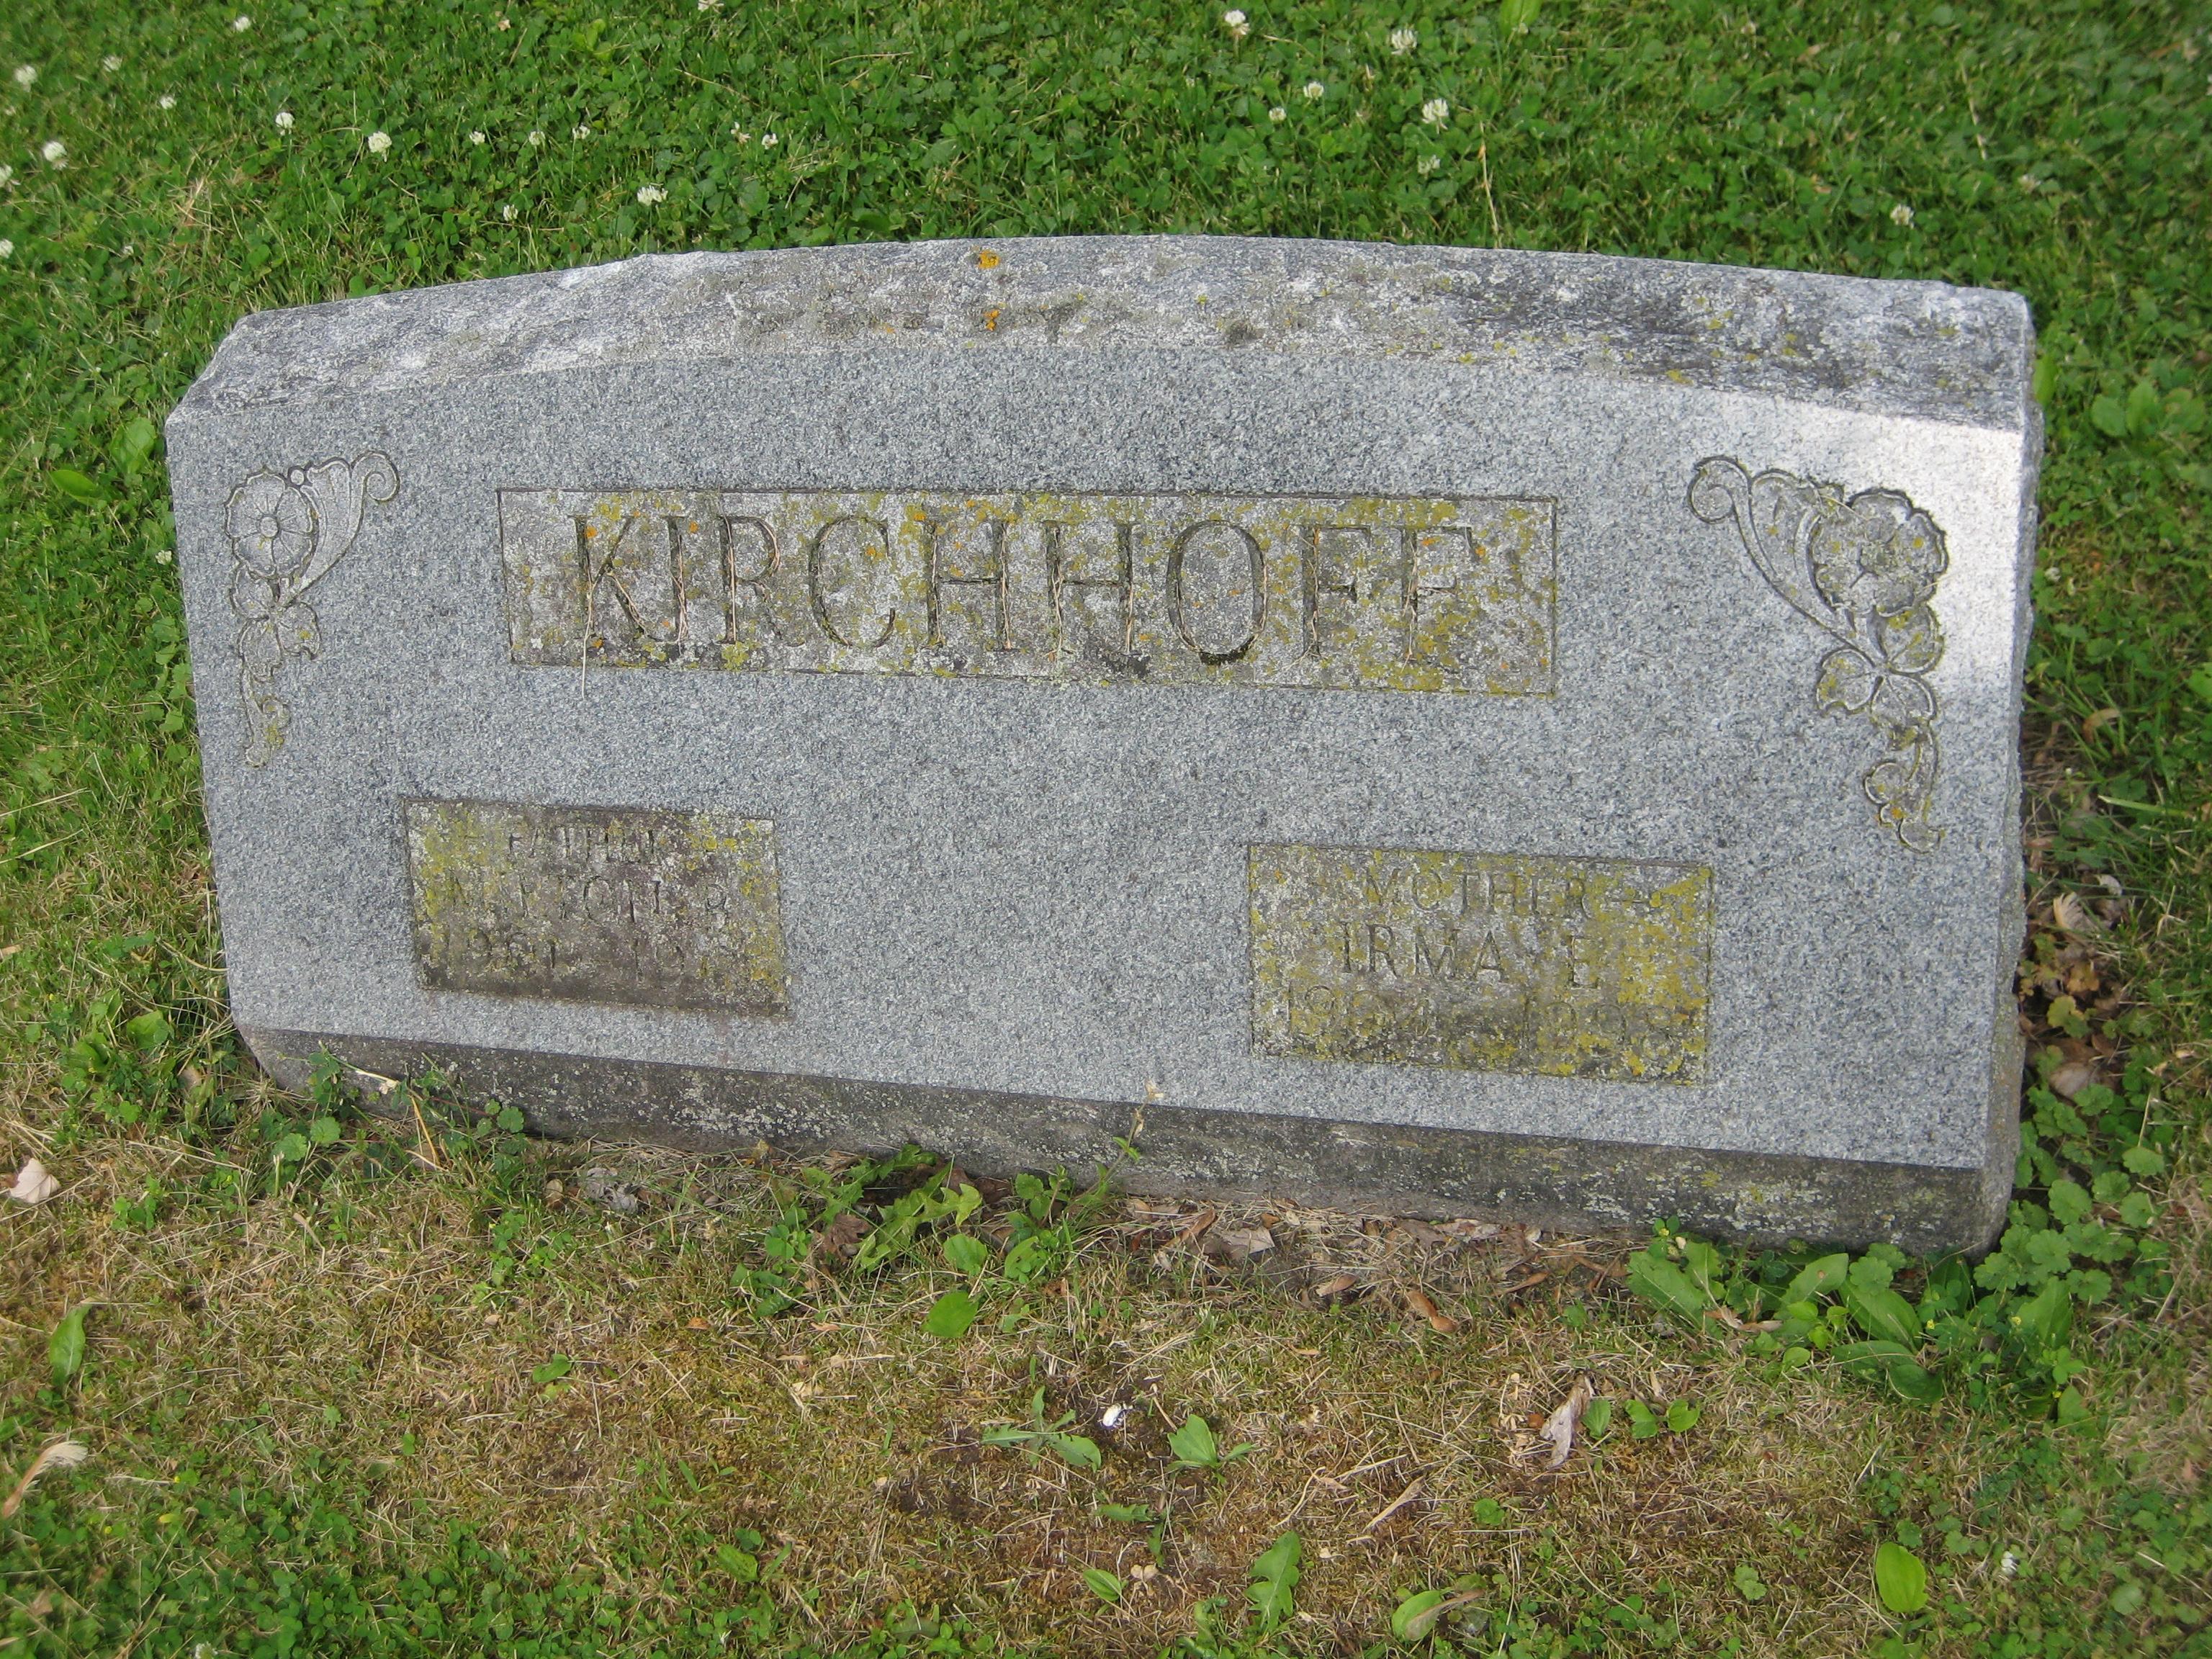 Milton Boice Kirchhoff, Gravestone